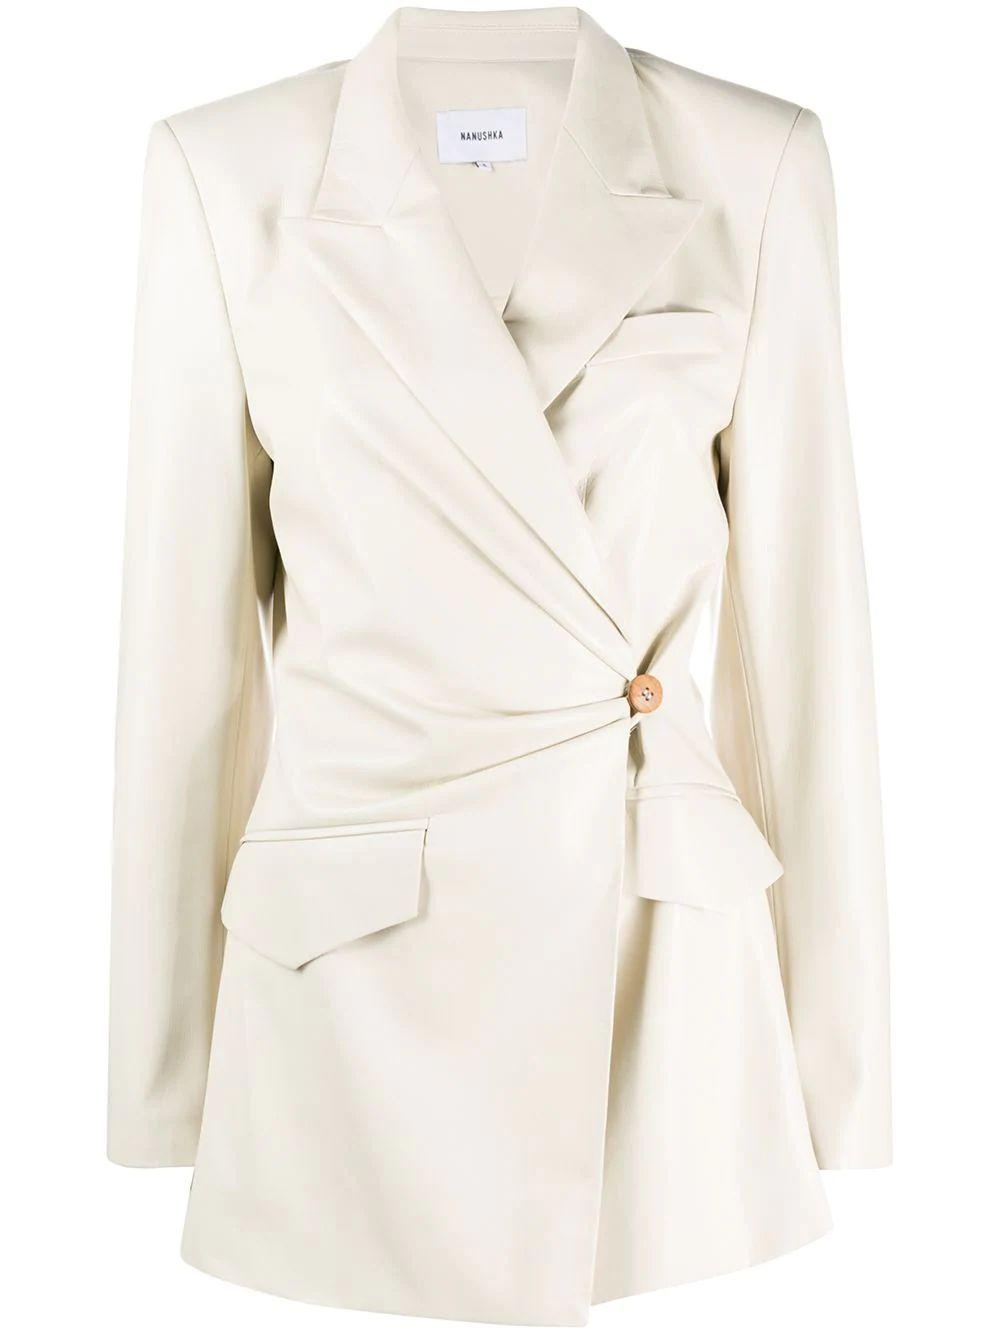 Blair Side Button Vegan Leather Jacket Item # WJA00116